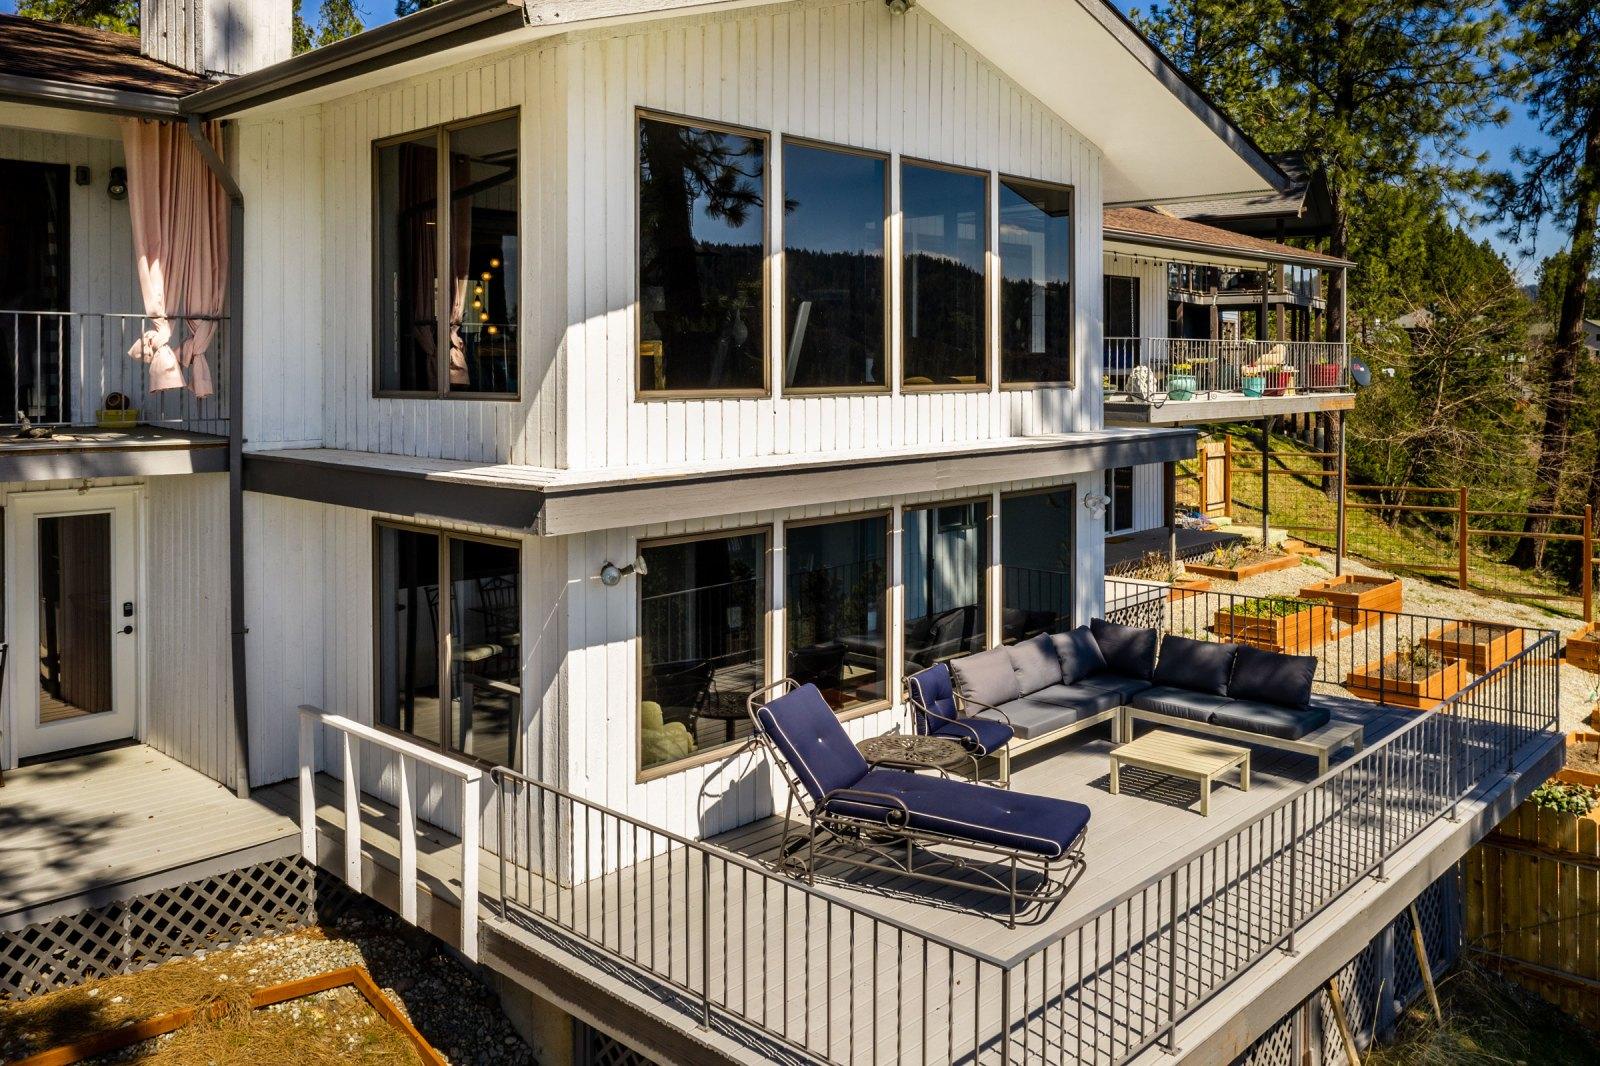 Real Estate Photography Spokane - Everyday I'm HOVERIN